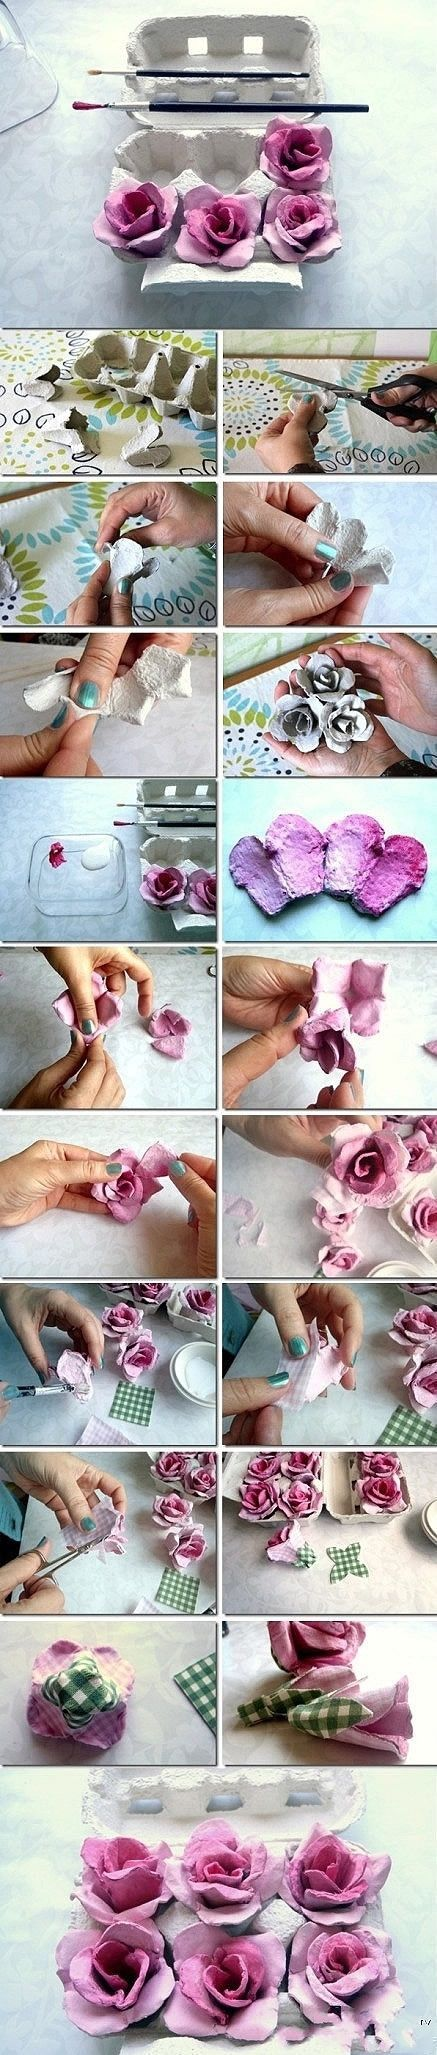 DIY Flower flowers diy crafts home made easy crafts craft idea crafts ideas diy ideas diy crafts diy idea do it yourself diy projects diy craft handmade: